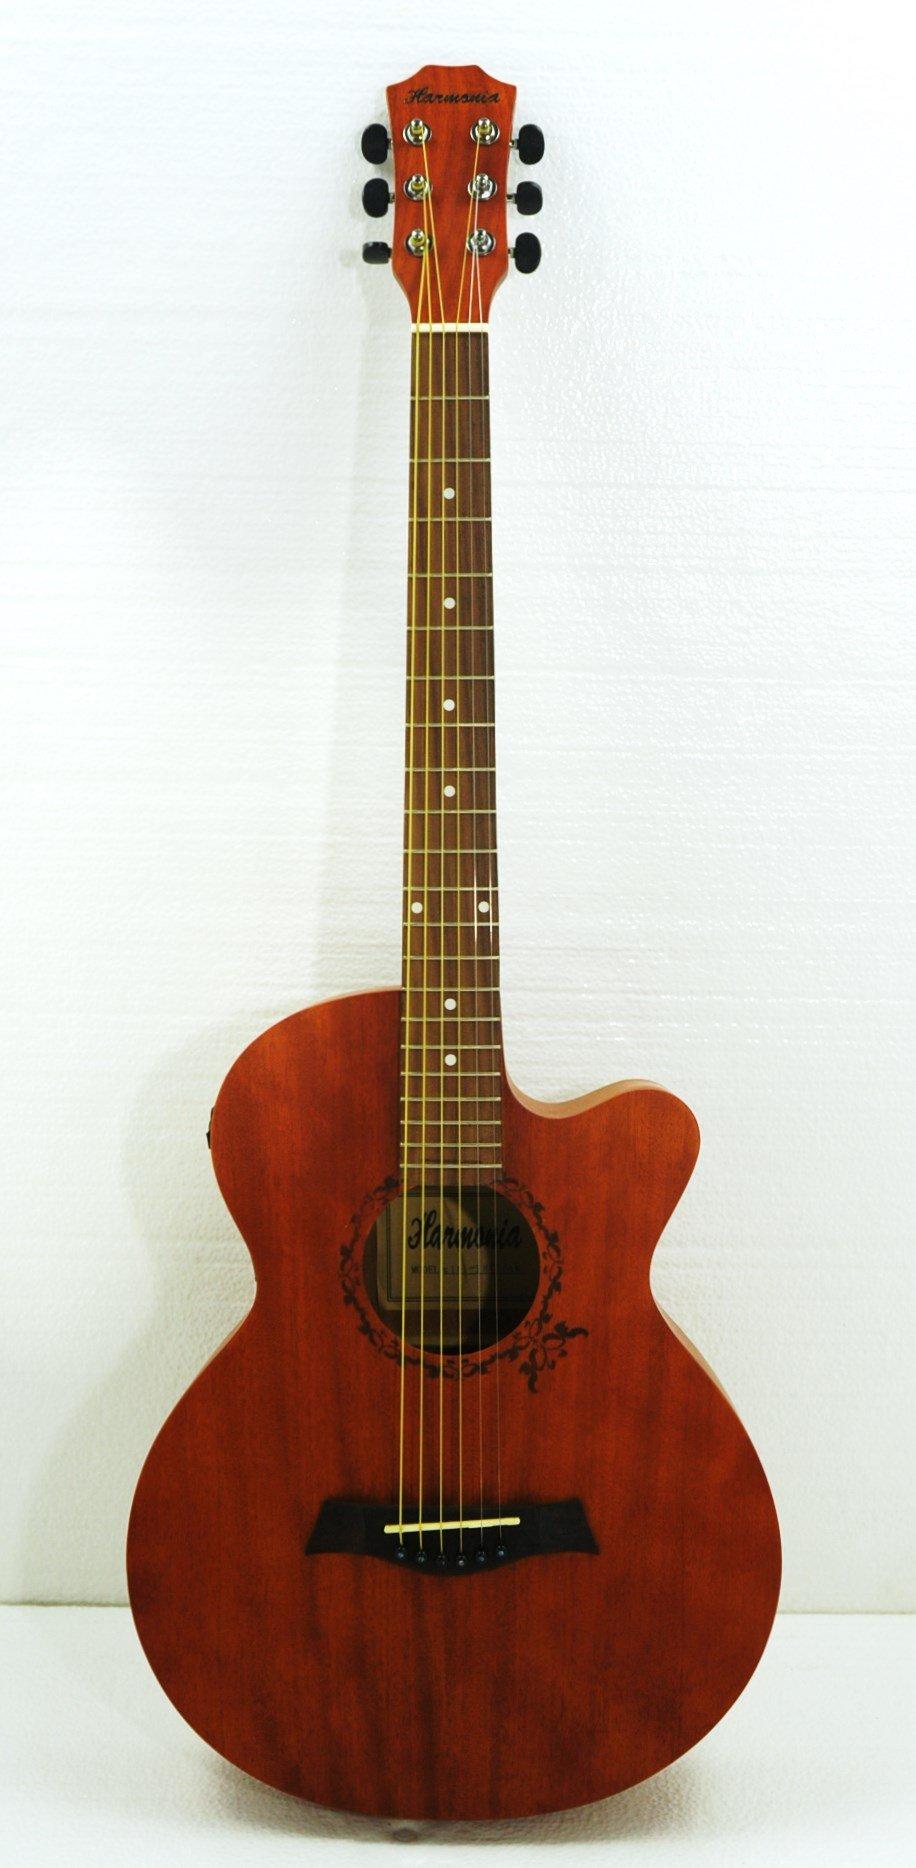 38'' Electric Acoustic Cutaway Steel String Guitar